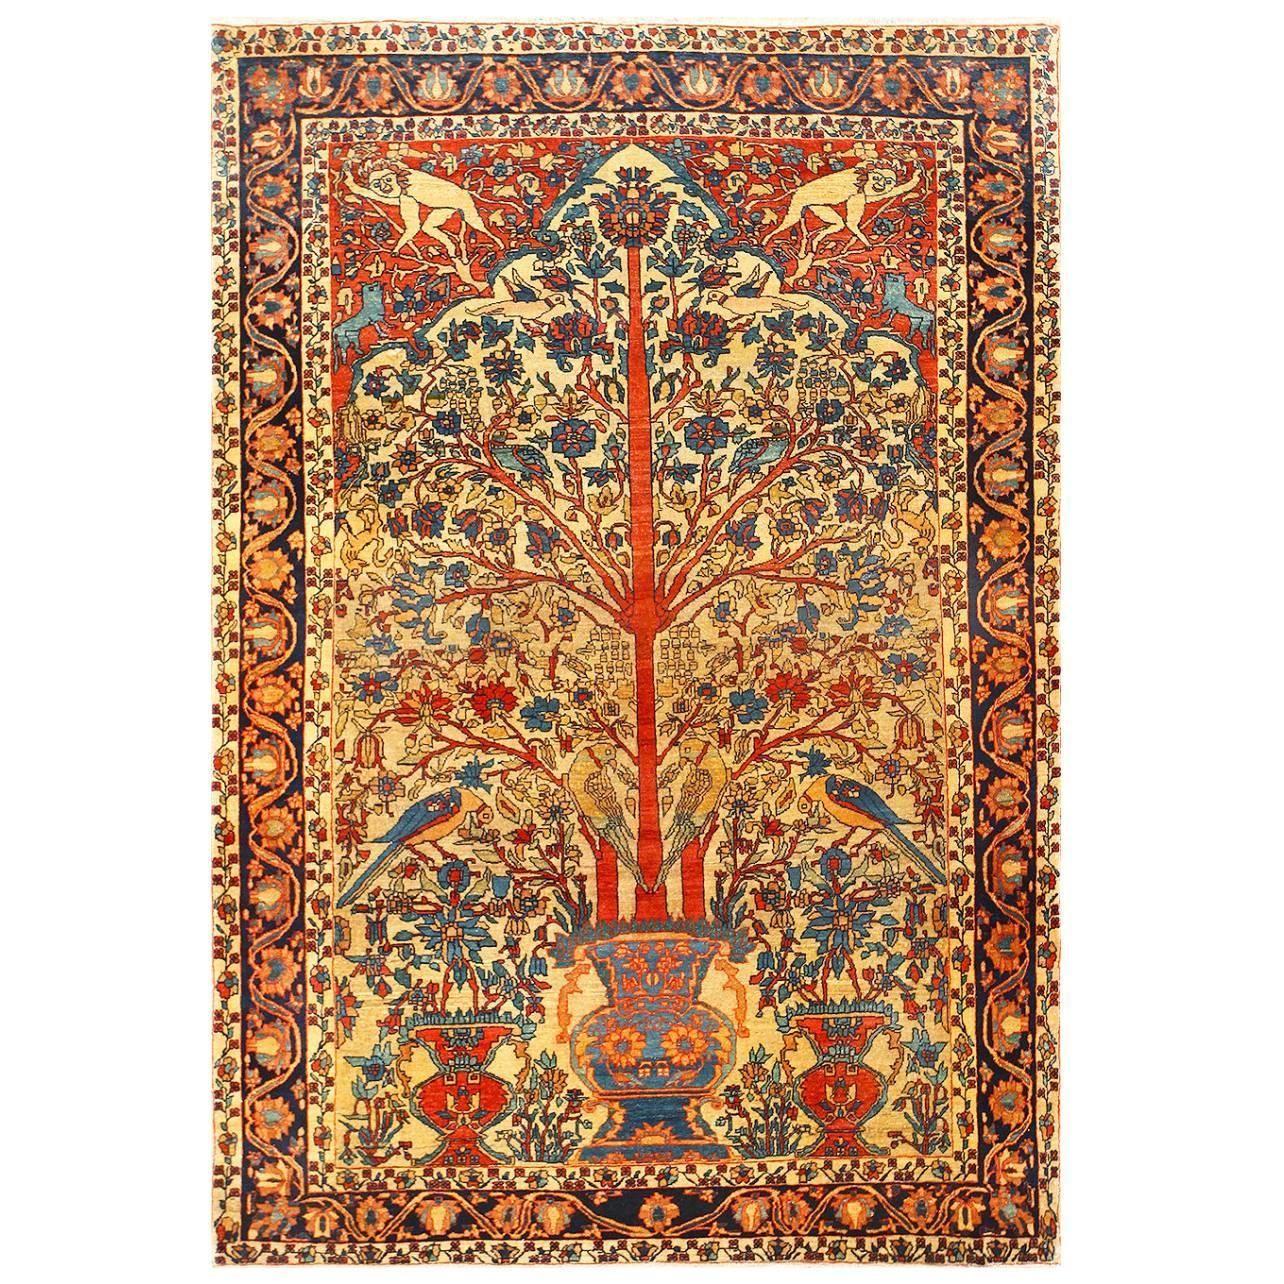 Antique Persian Fine Sarouk Farahan Tree Of Life Rug 1stdibs Com Modern Persian Rug Rugs Rugs On Carpet